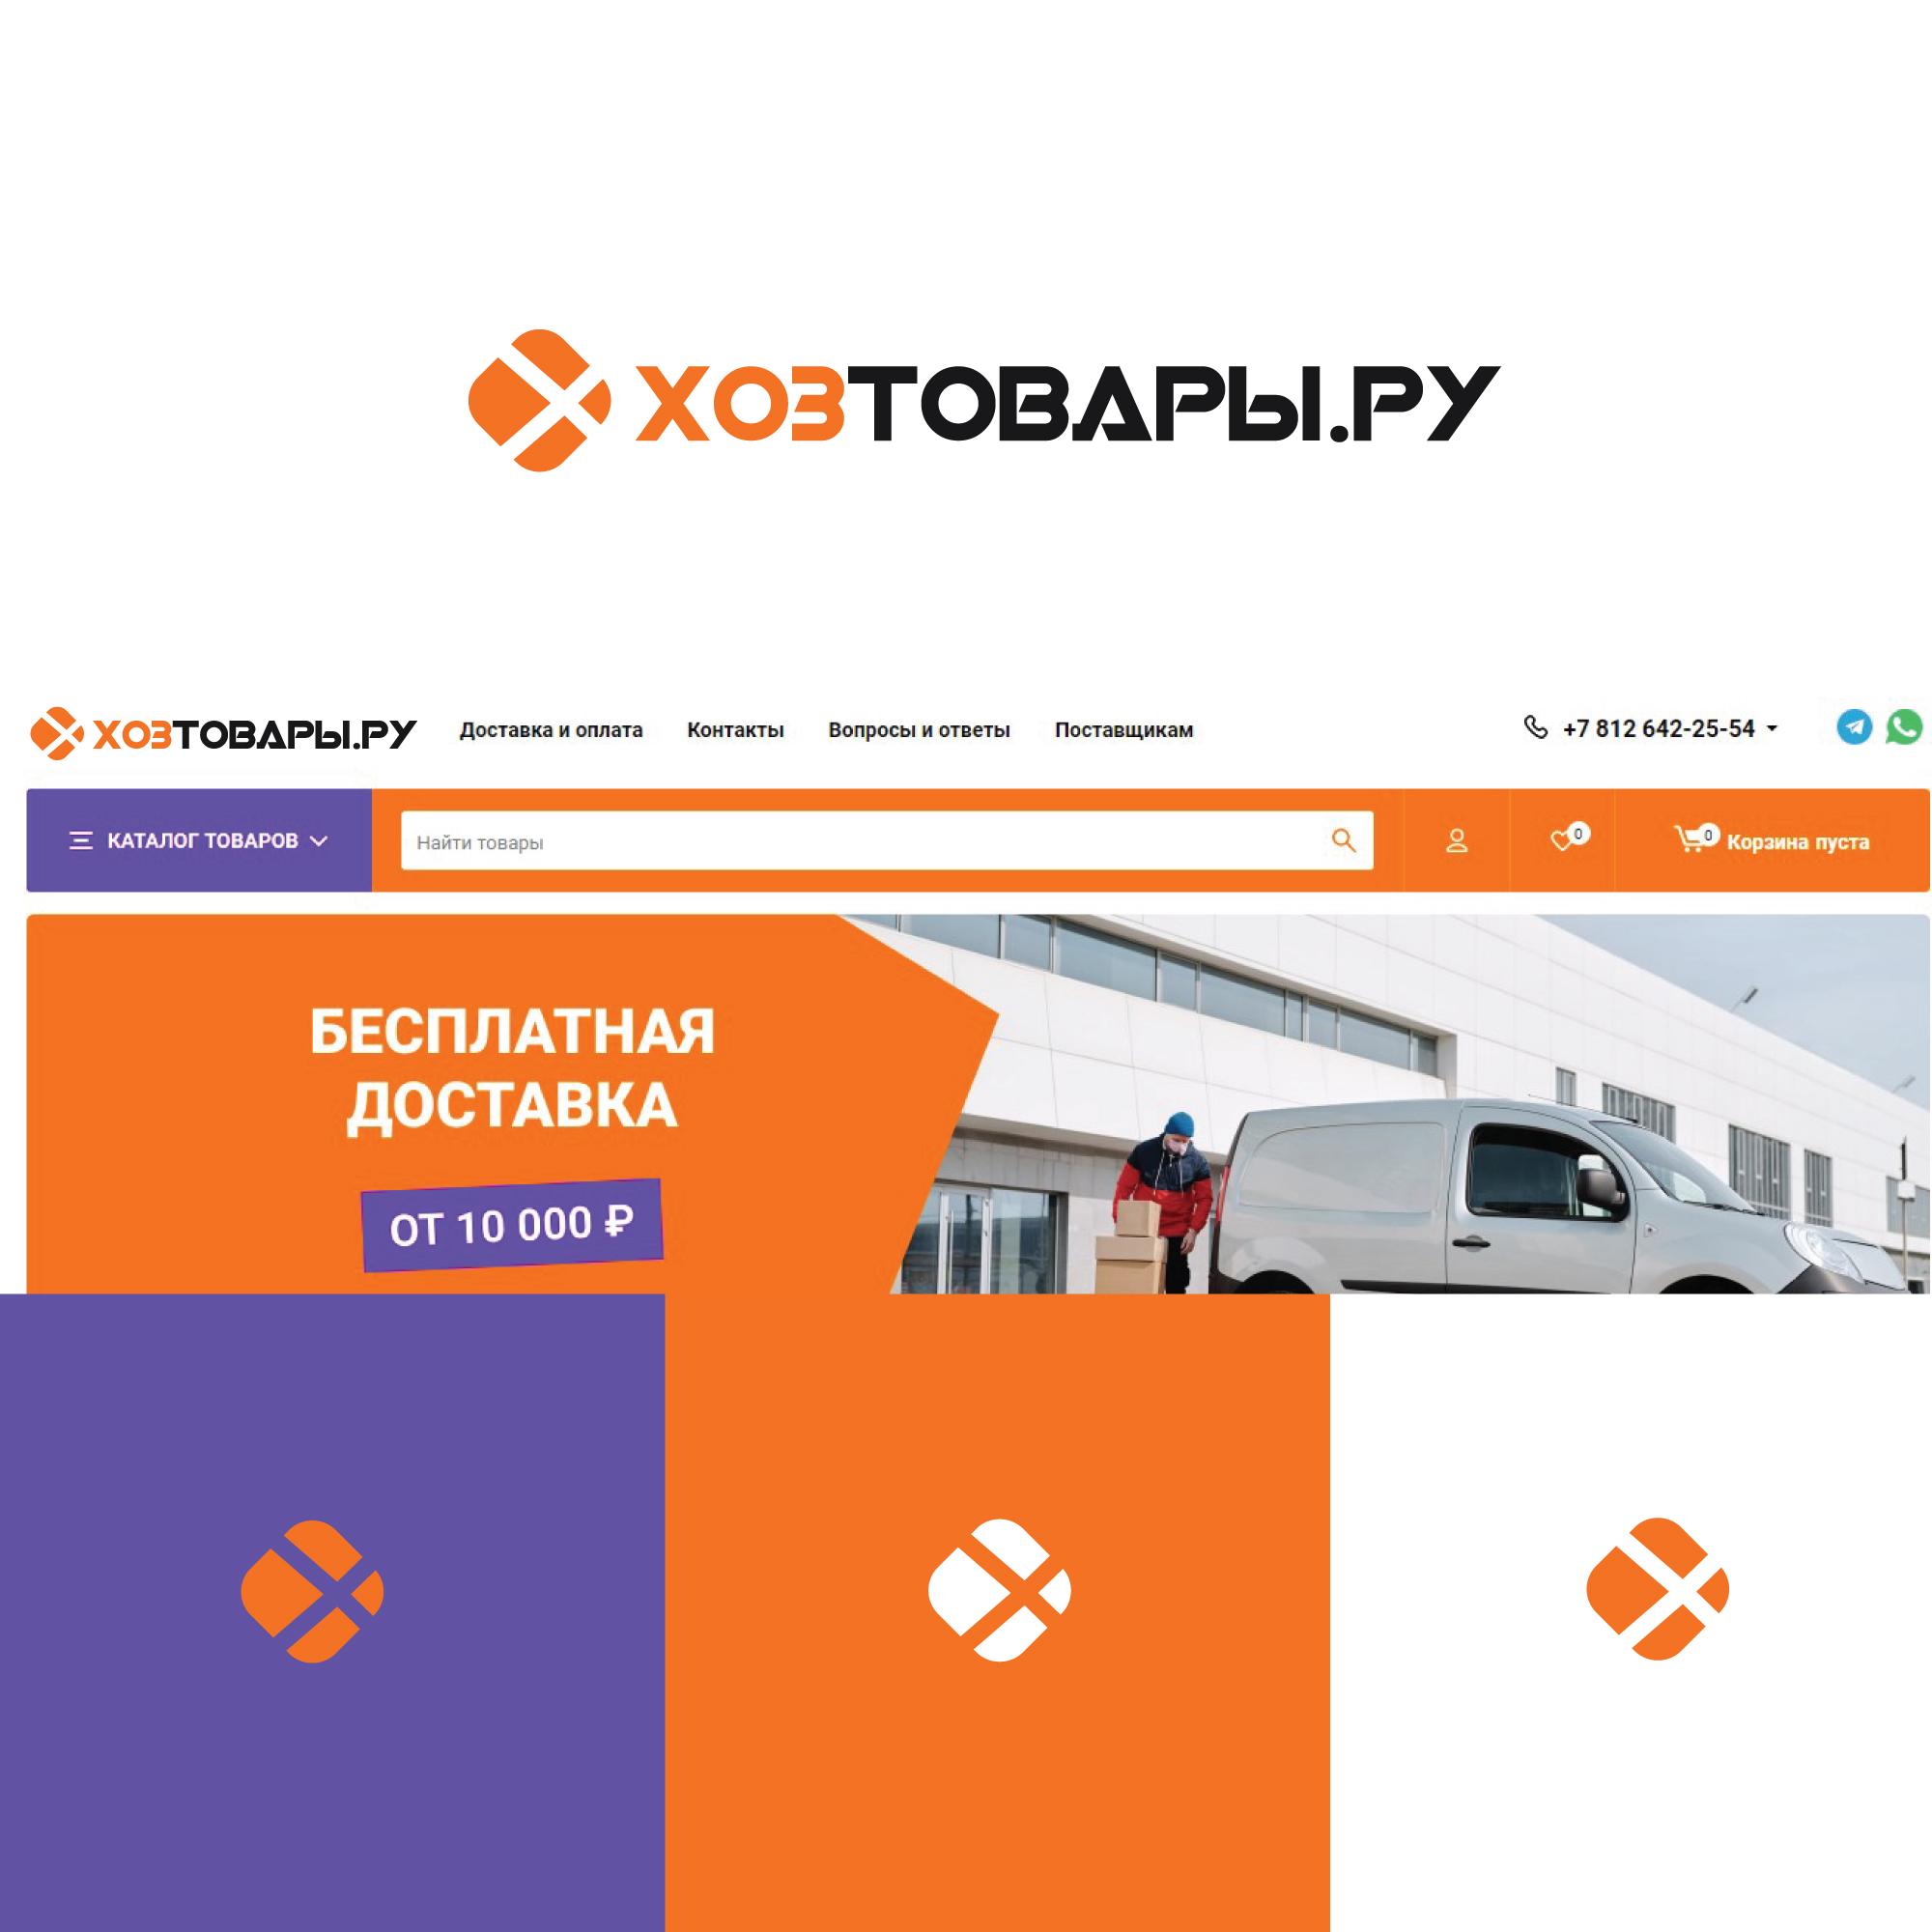 Разработка логотипа для оптового интернет-магазина «Хозтовары.ру» фото f_546608a62999d913.jpg